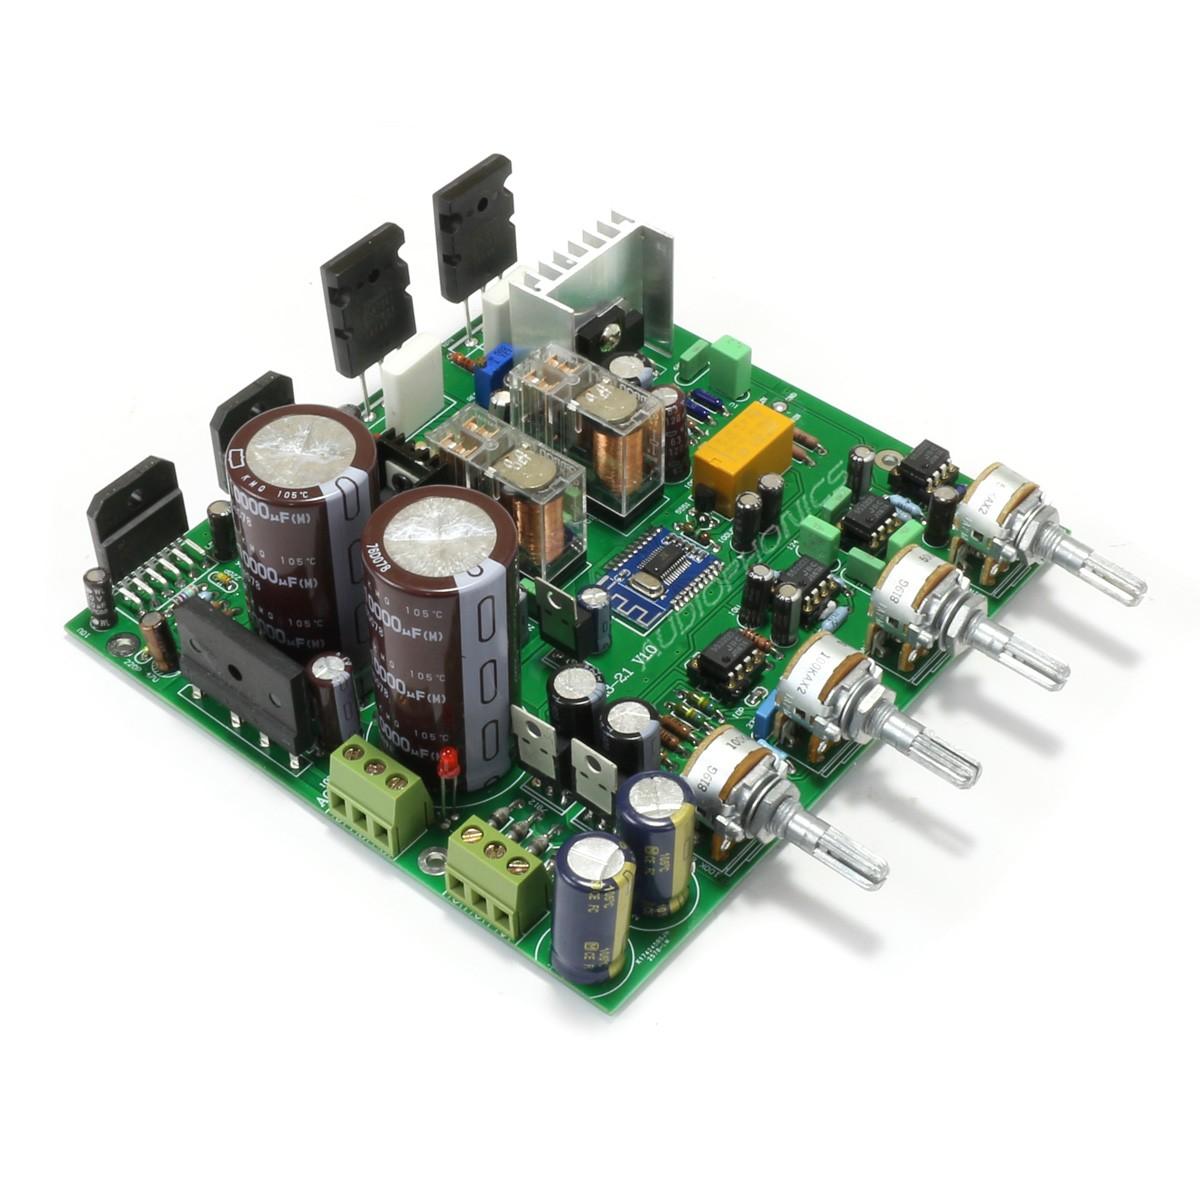 2.1 Amplifier Module Bluetooth 2x68W + 1x150W LM3886 with Tone Control